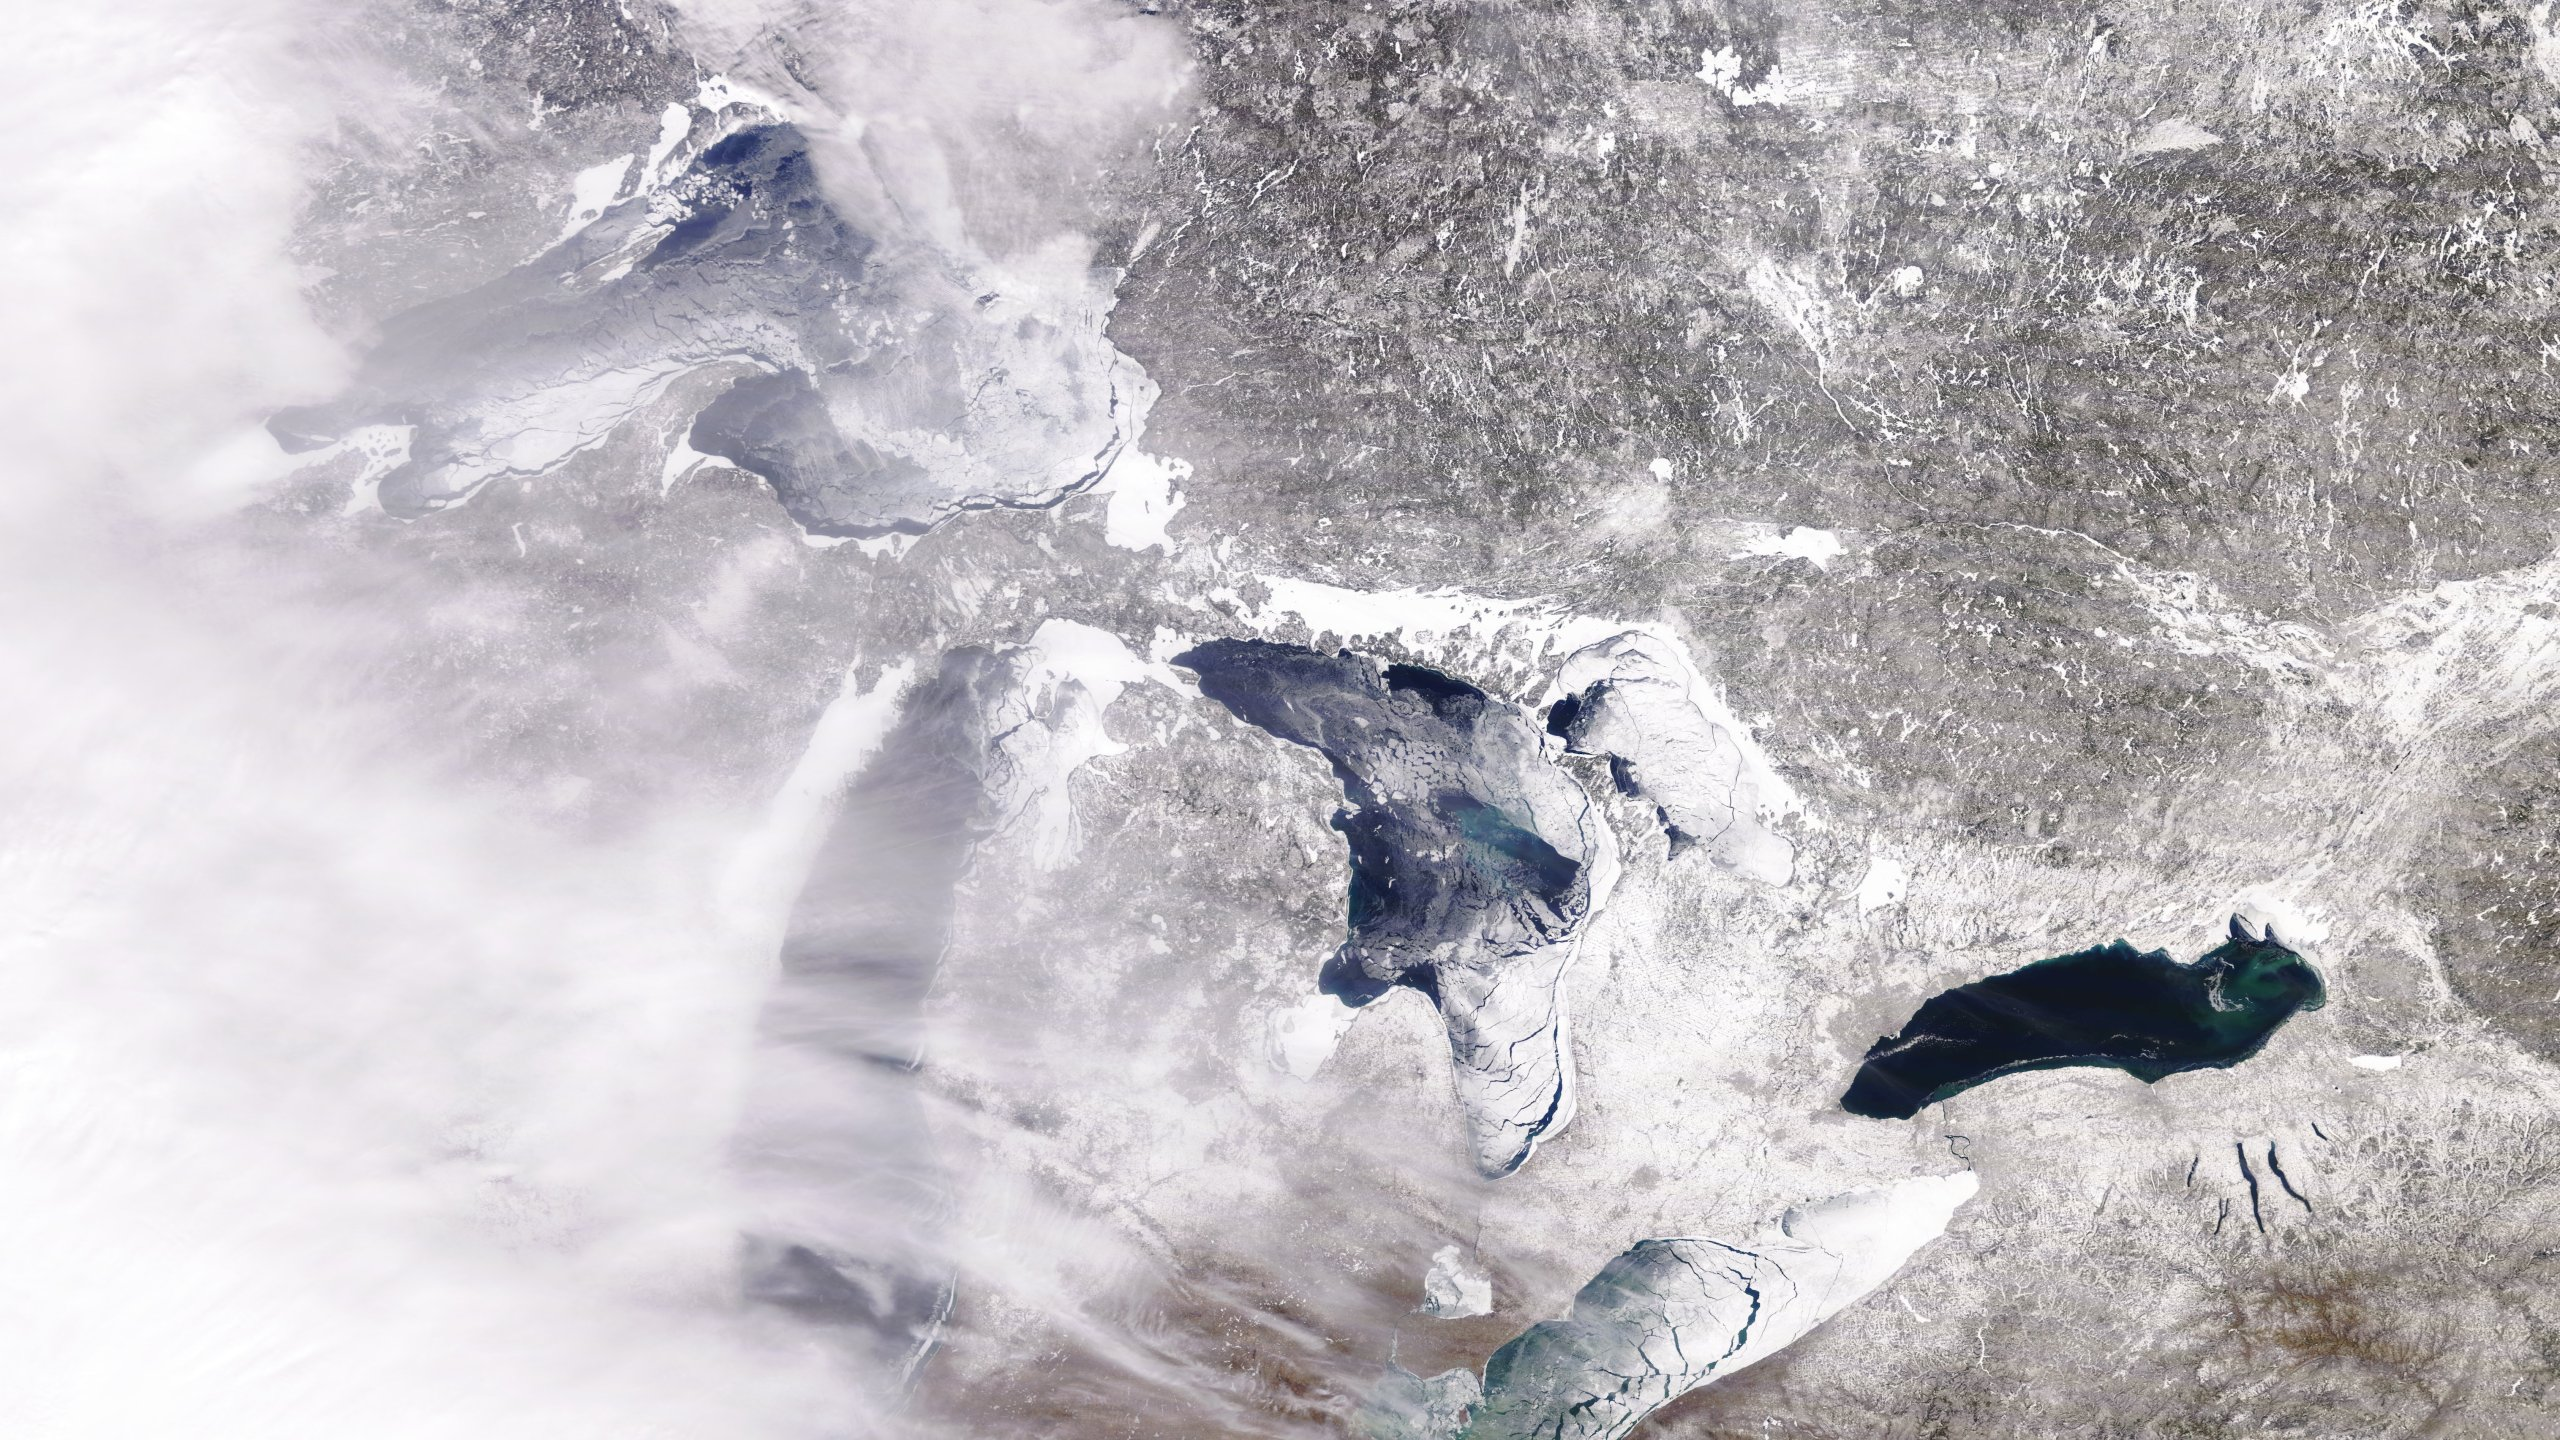 Modis Great Lakes 3 9 19 Maximum Ice Extent 80.87%_1552362238122.jpg.jpg